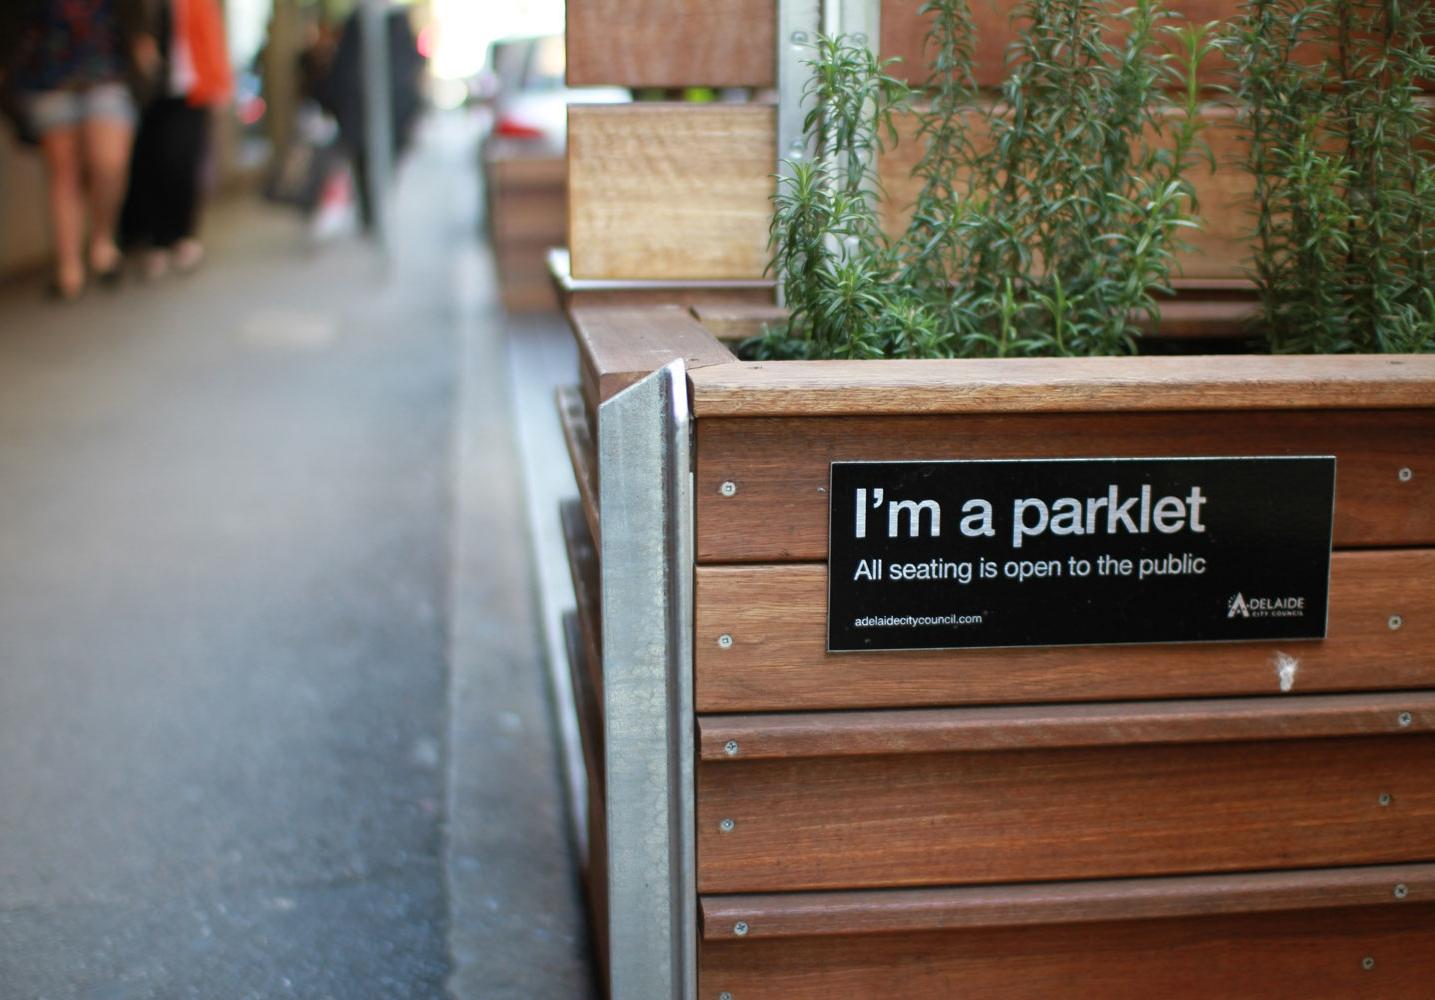 Foods for Life Parklet - Adelaide, SA, 2013